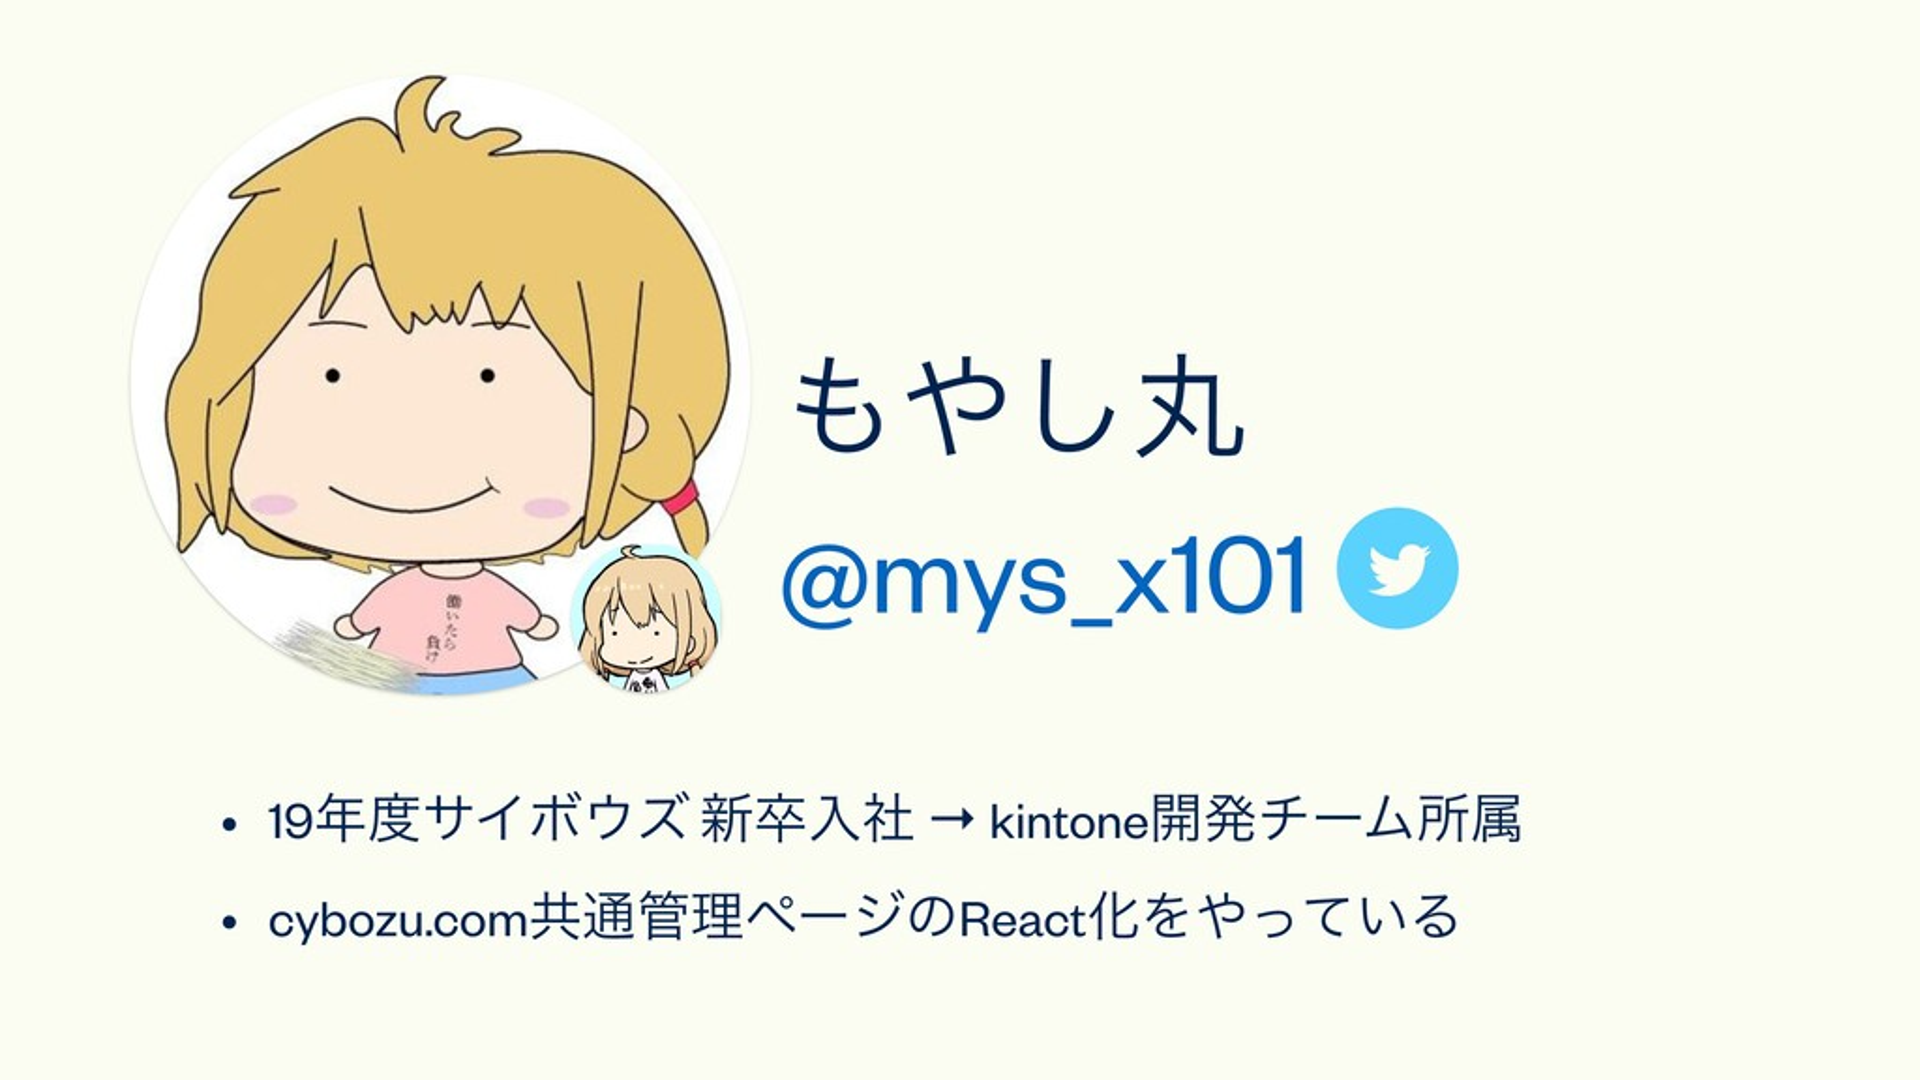 ؙ͠ @mys_x101 • 19αΠϘζ ৽ଔೖࣾ → kintone։ൃνʔϜॴ...